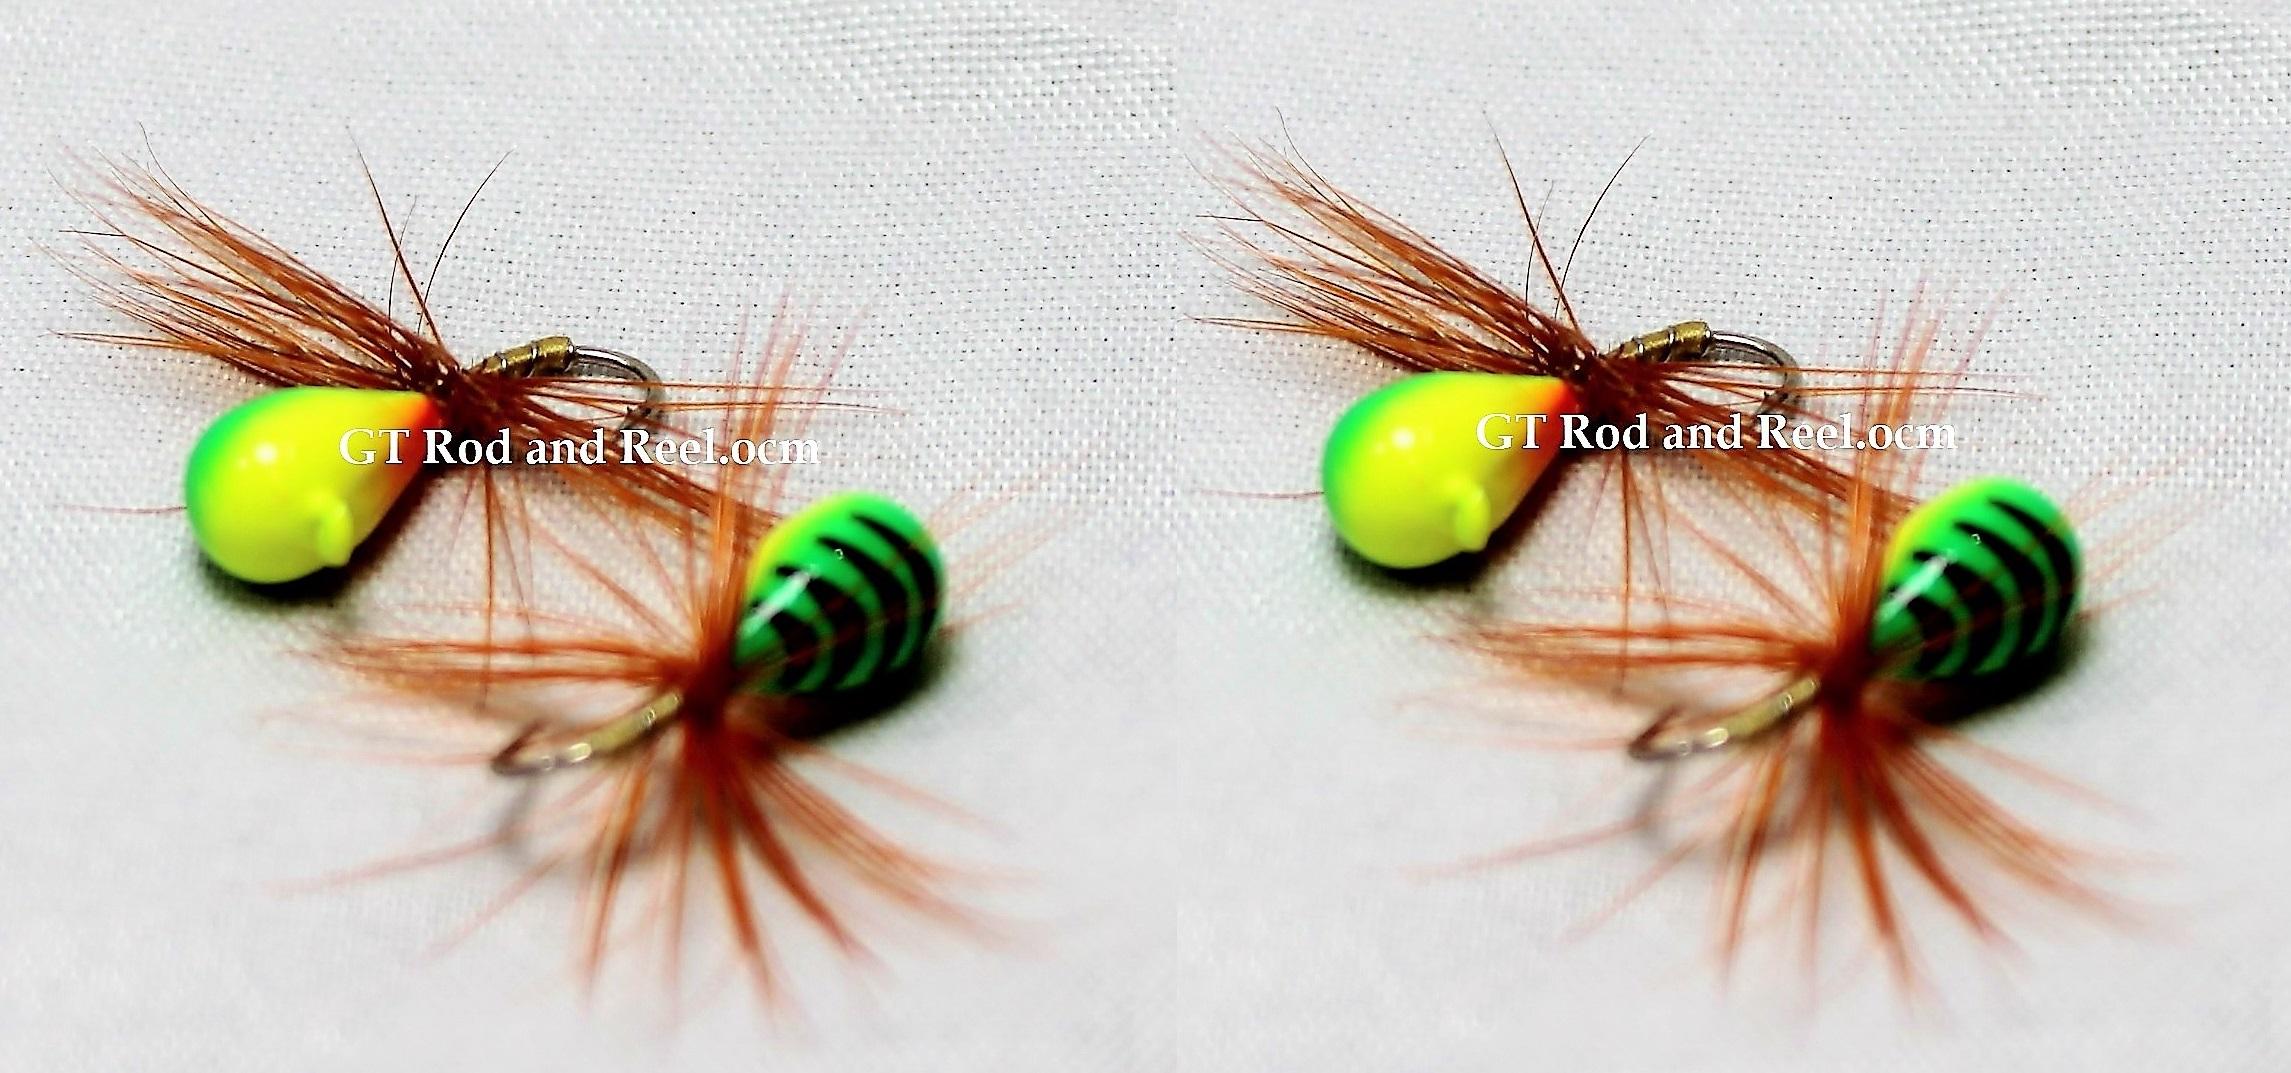 #905-f 4 each Tungsten Ice Fishing Tear Drop Jig 1.85 Gram #12 Hook w/Feather Glowing Tiger